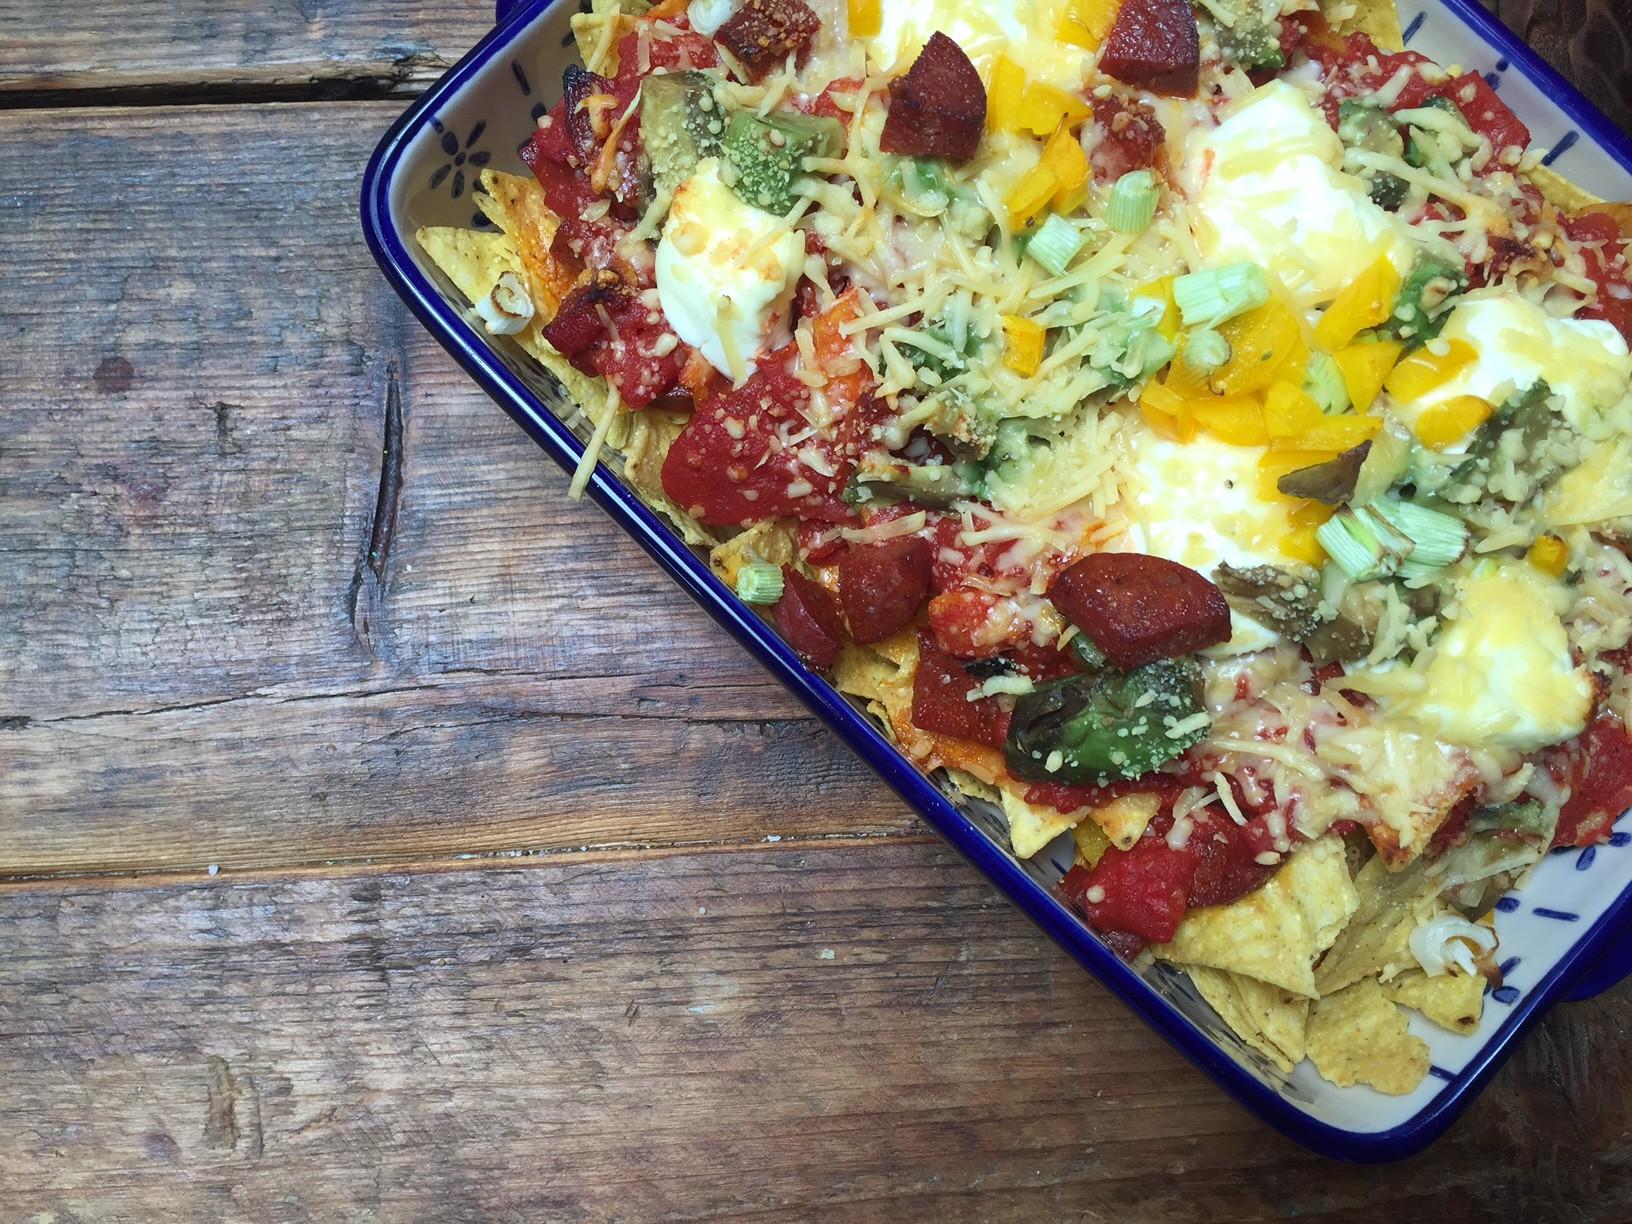 Nachoschotel met chorizo en paprika ovenschotel recept Foodblog Foodinista